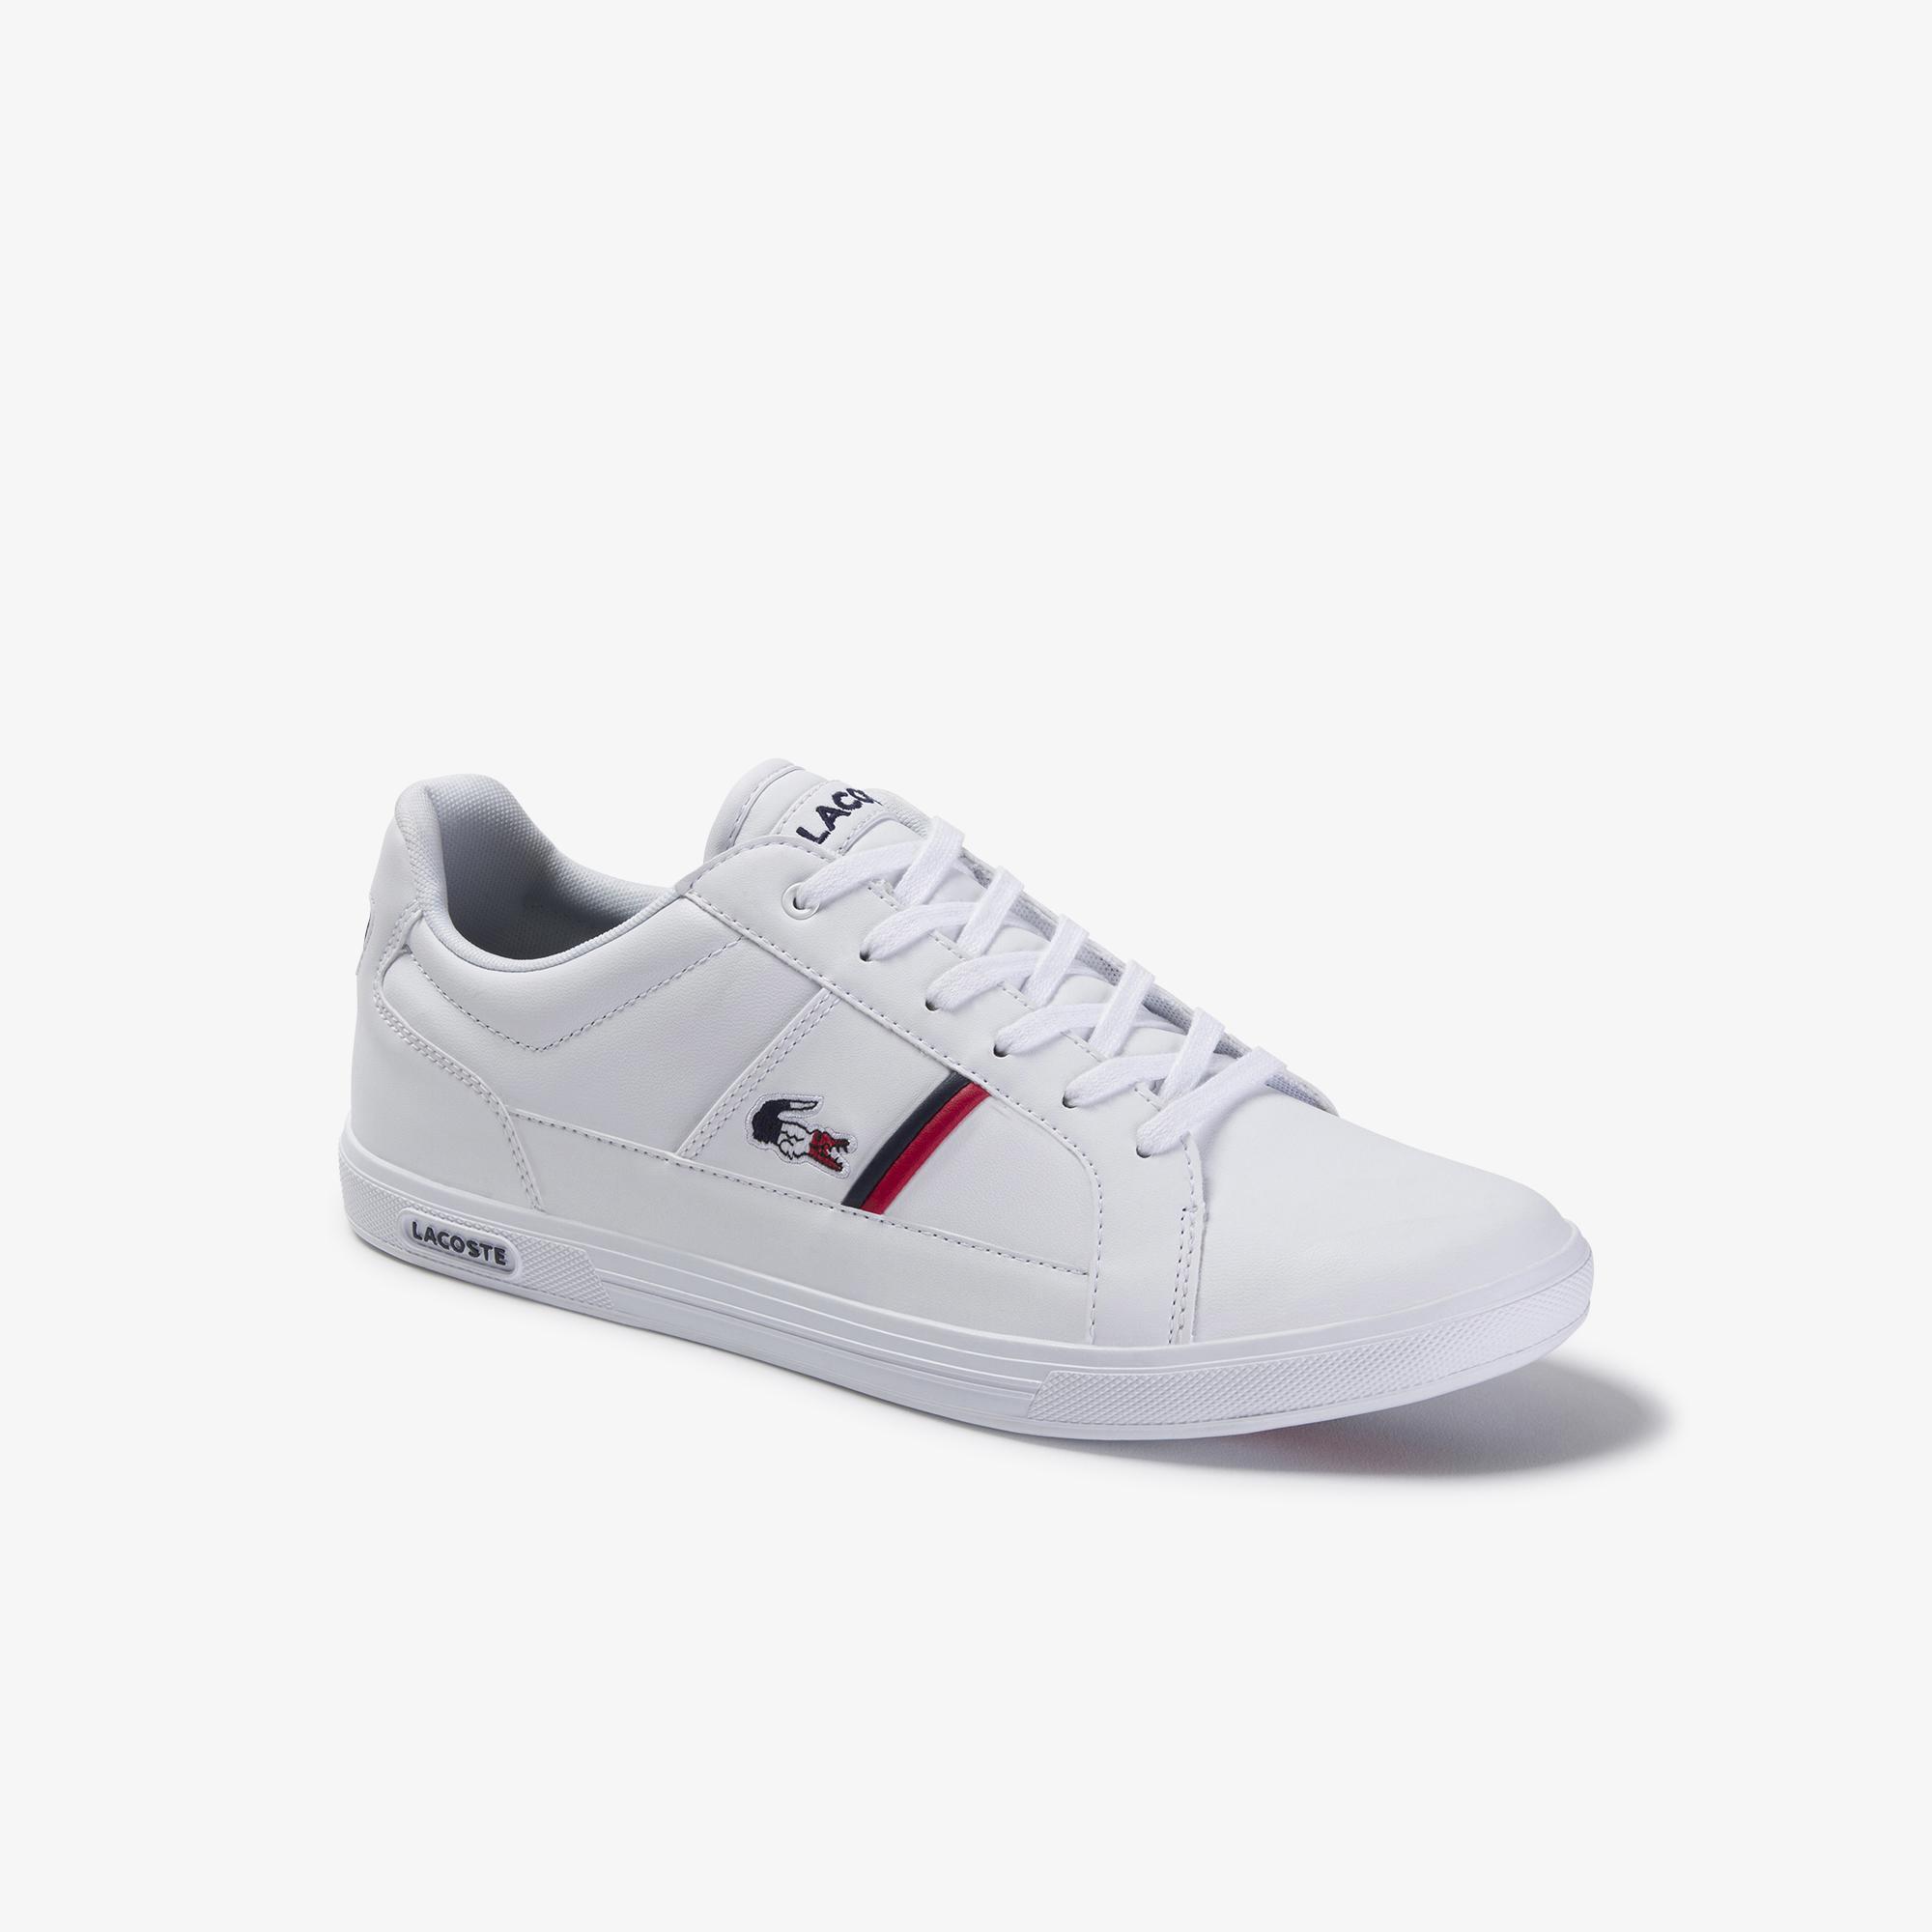 Lacoste Men's Europa Tricolour Leather Sneakers